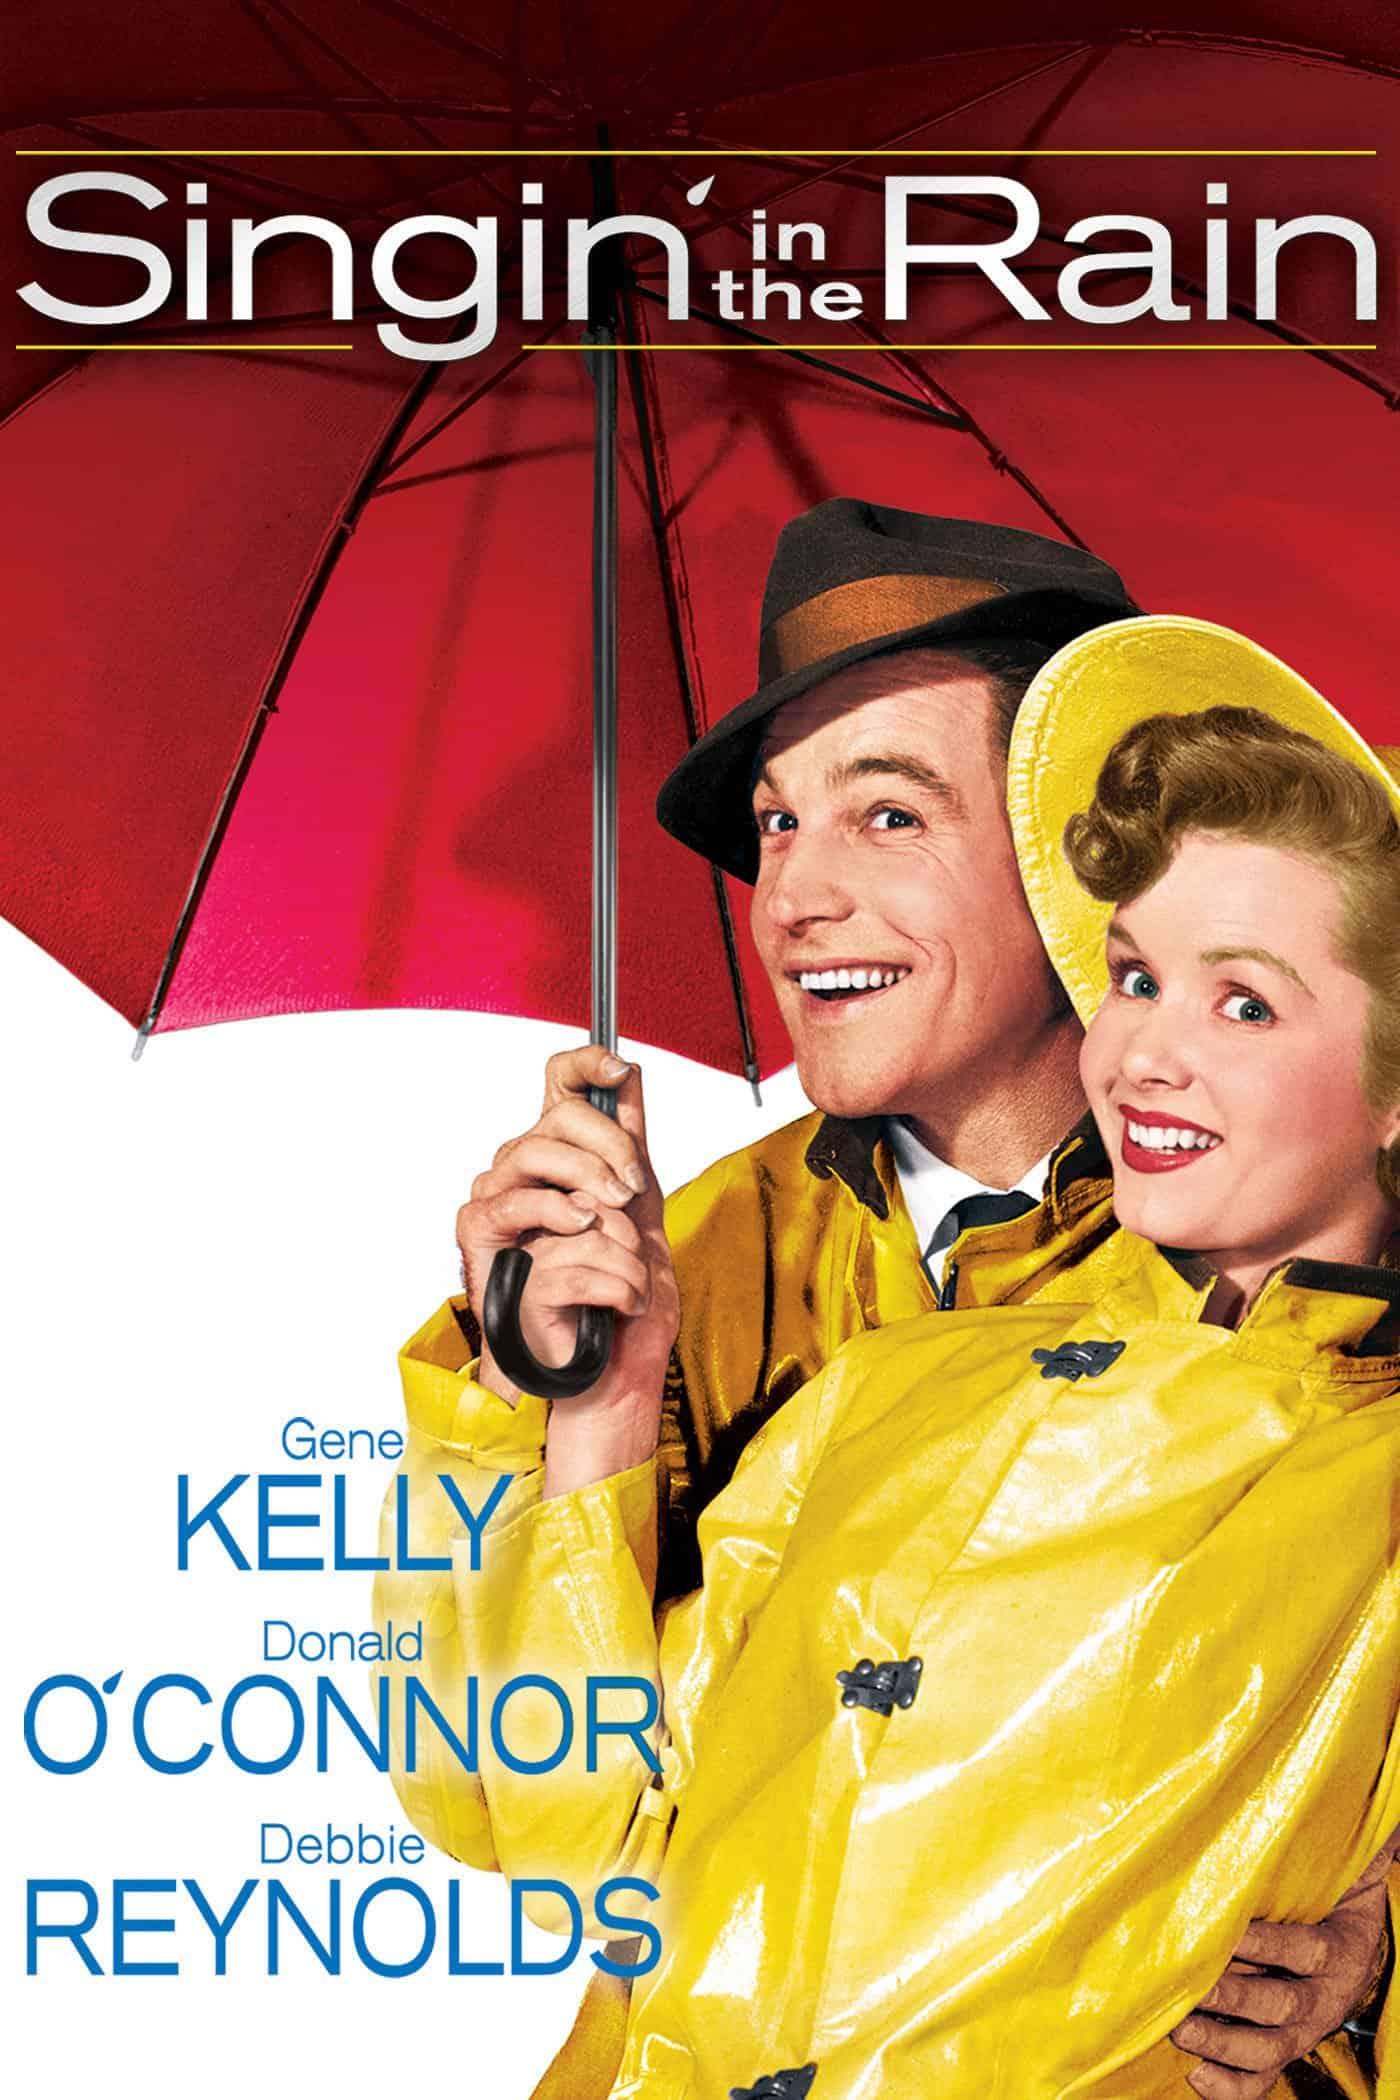 Singin' in the Rain, 1952